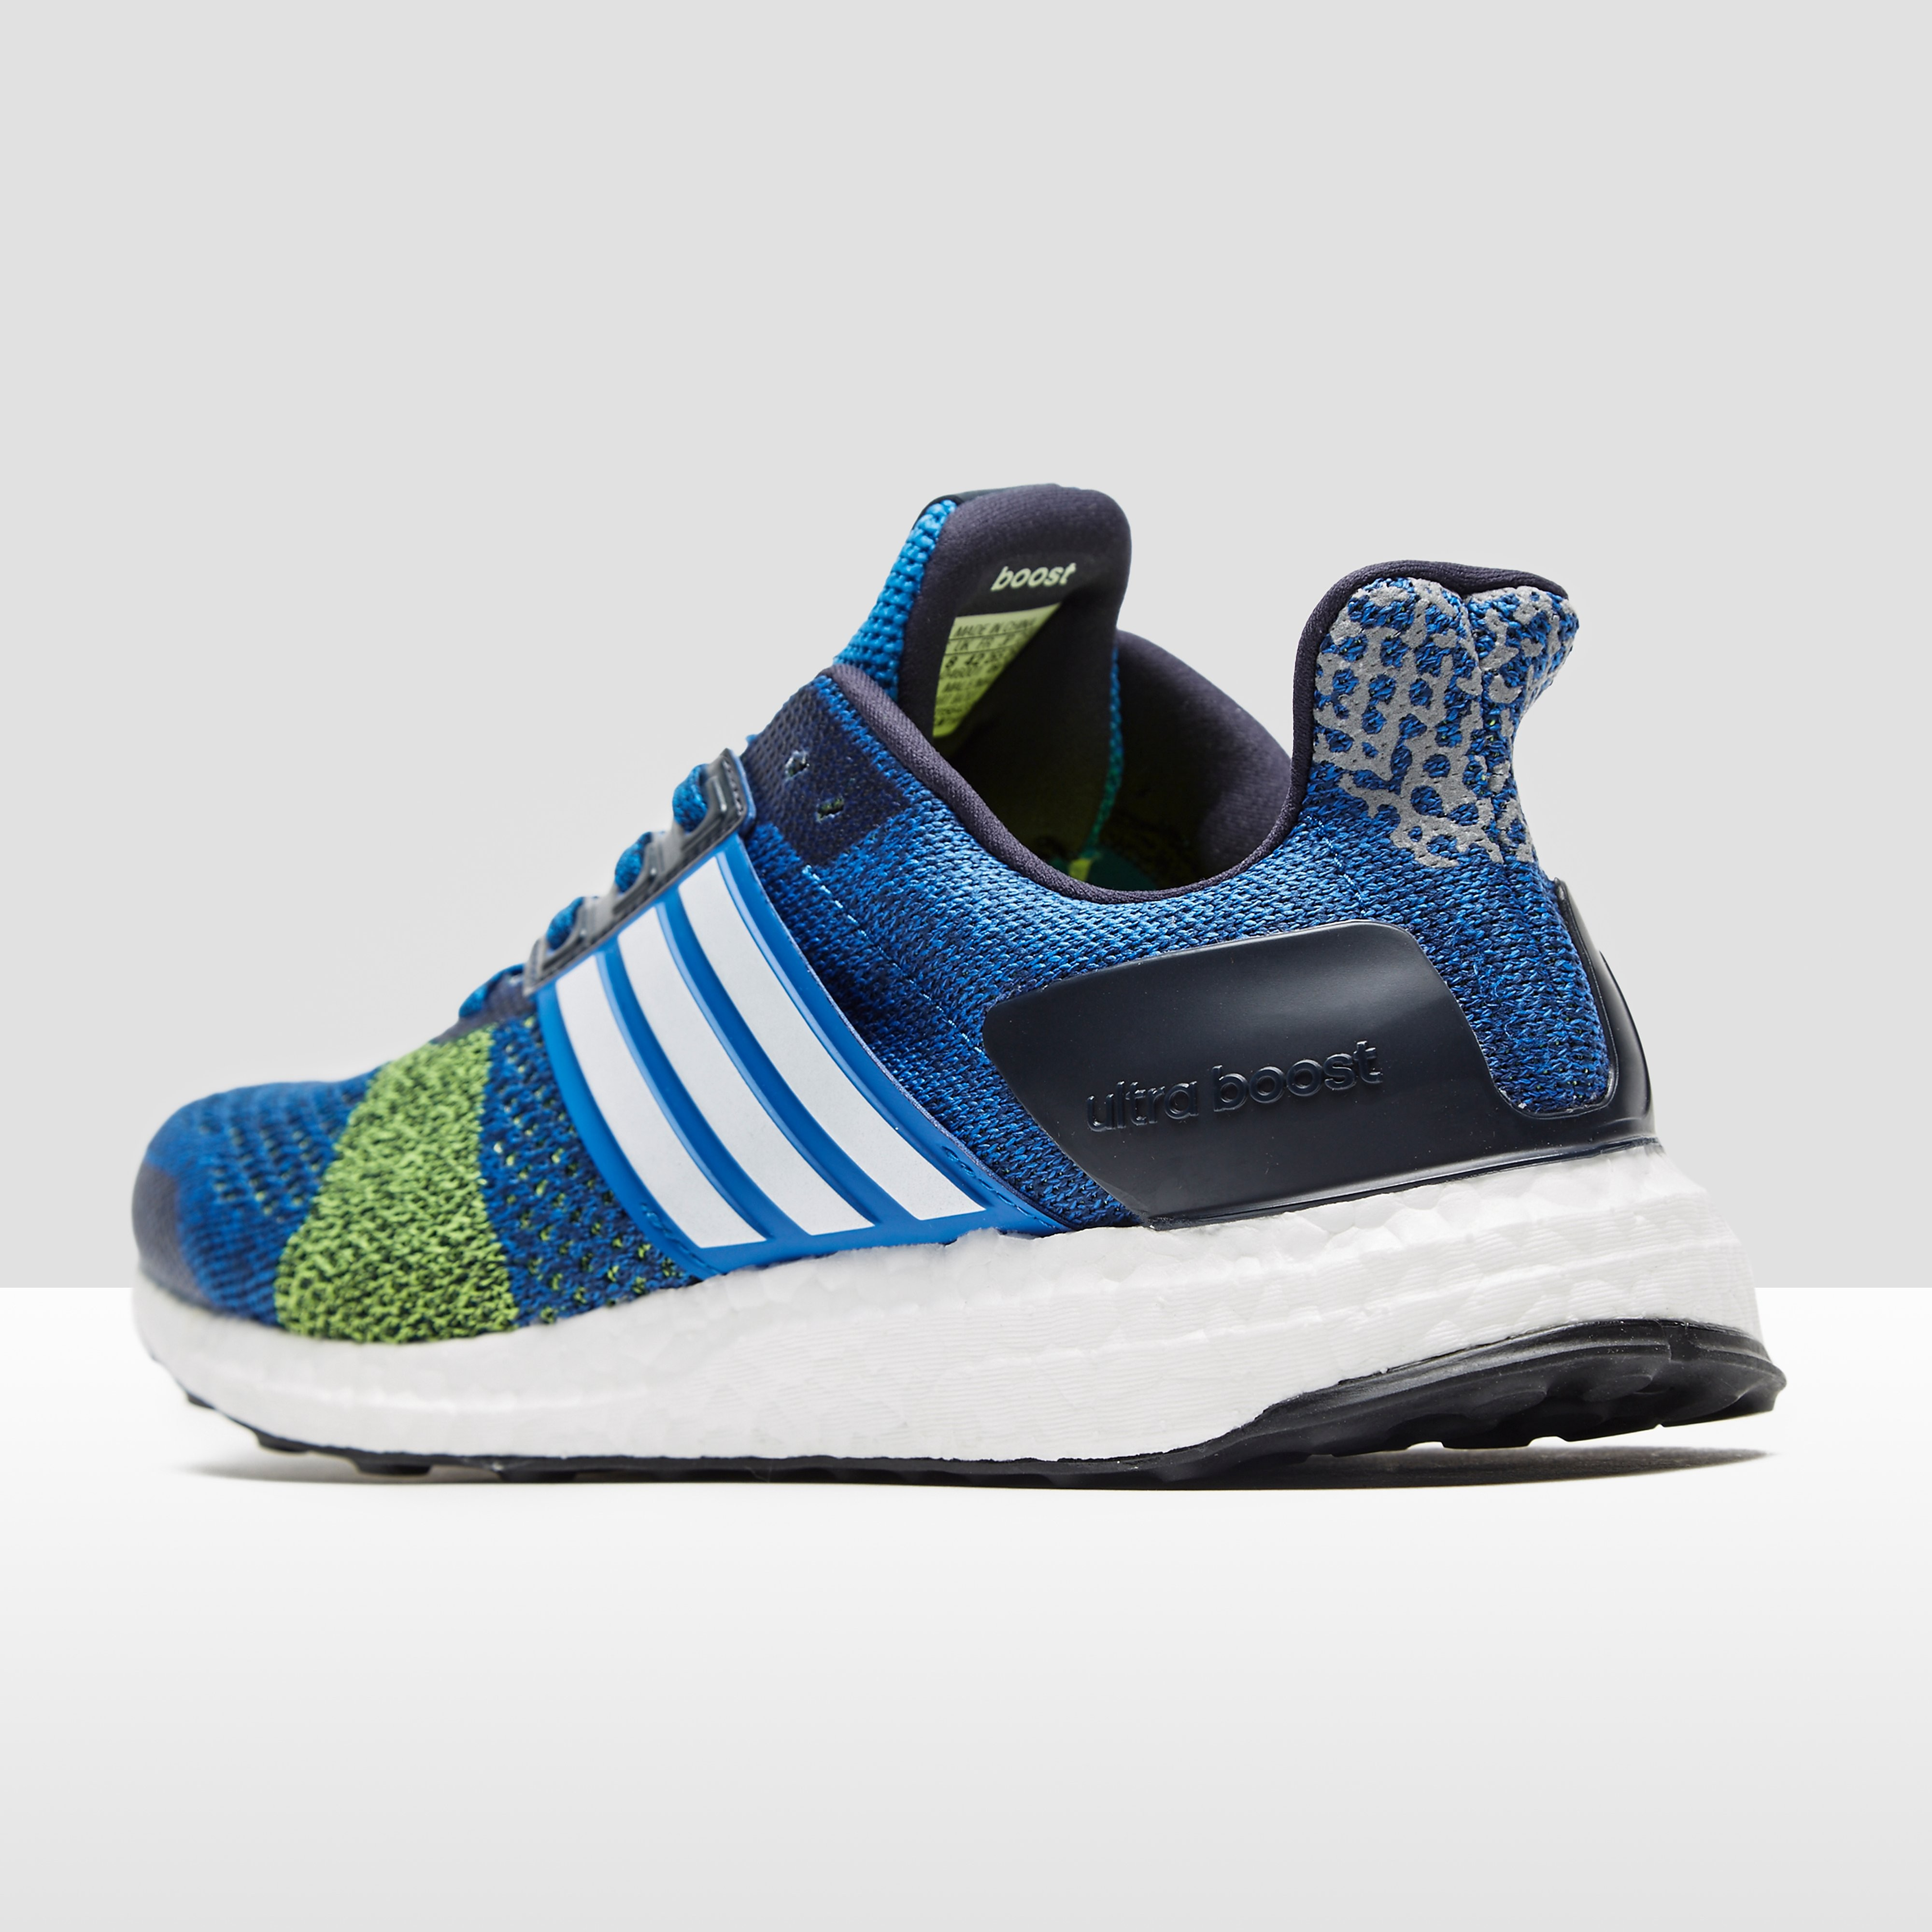 adidas Ultra Boost Men's Running Shoes